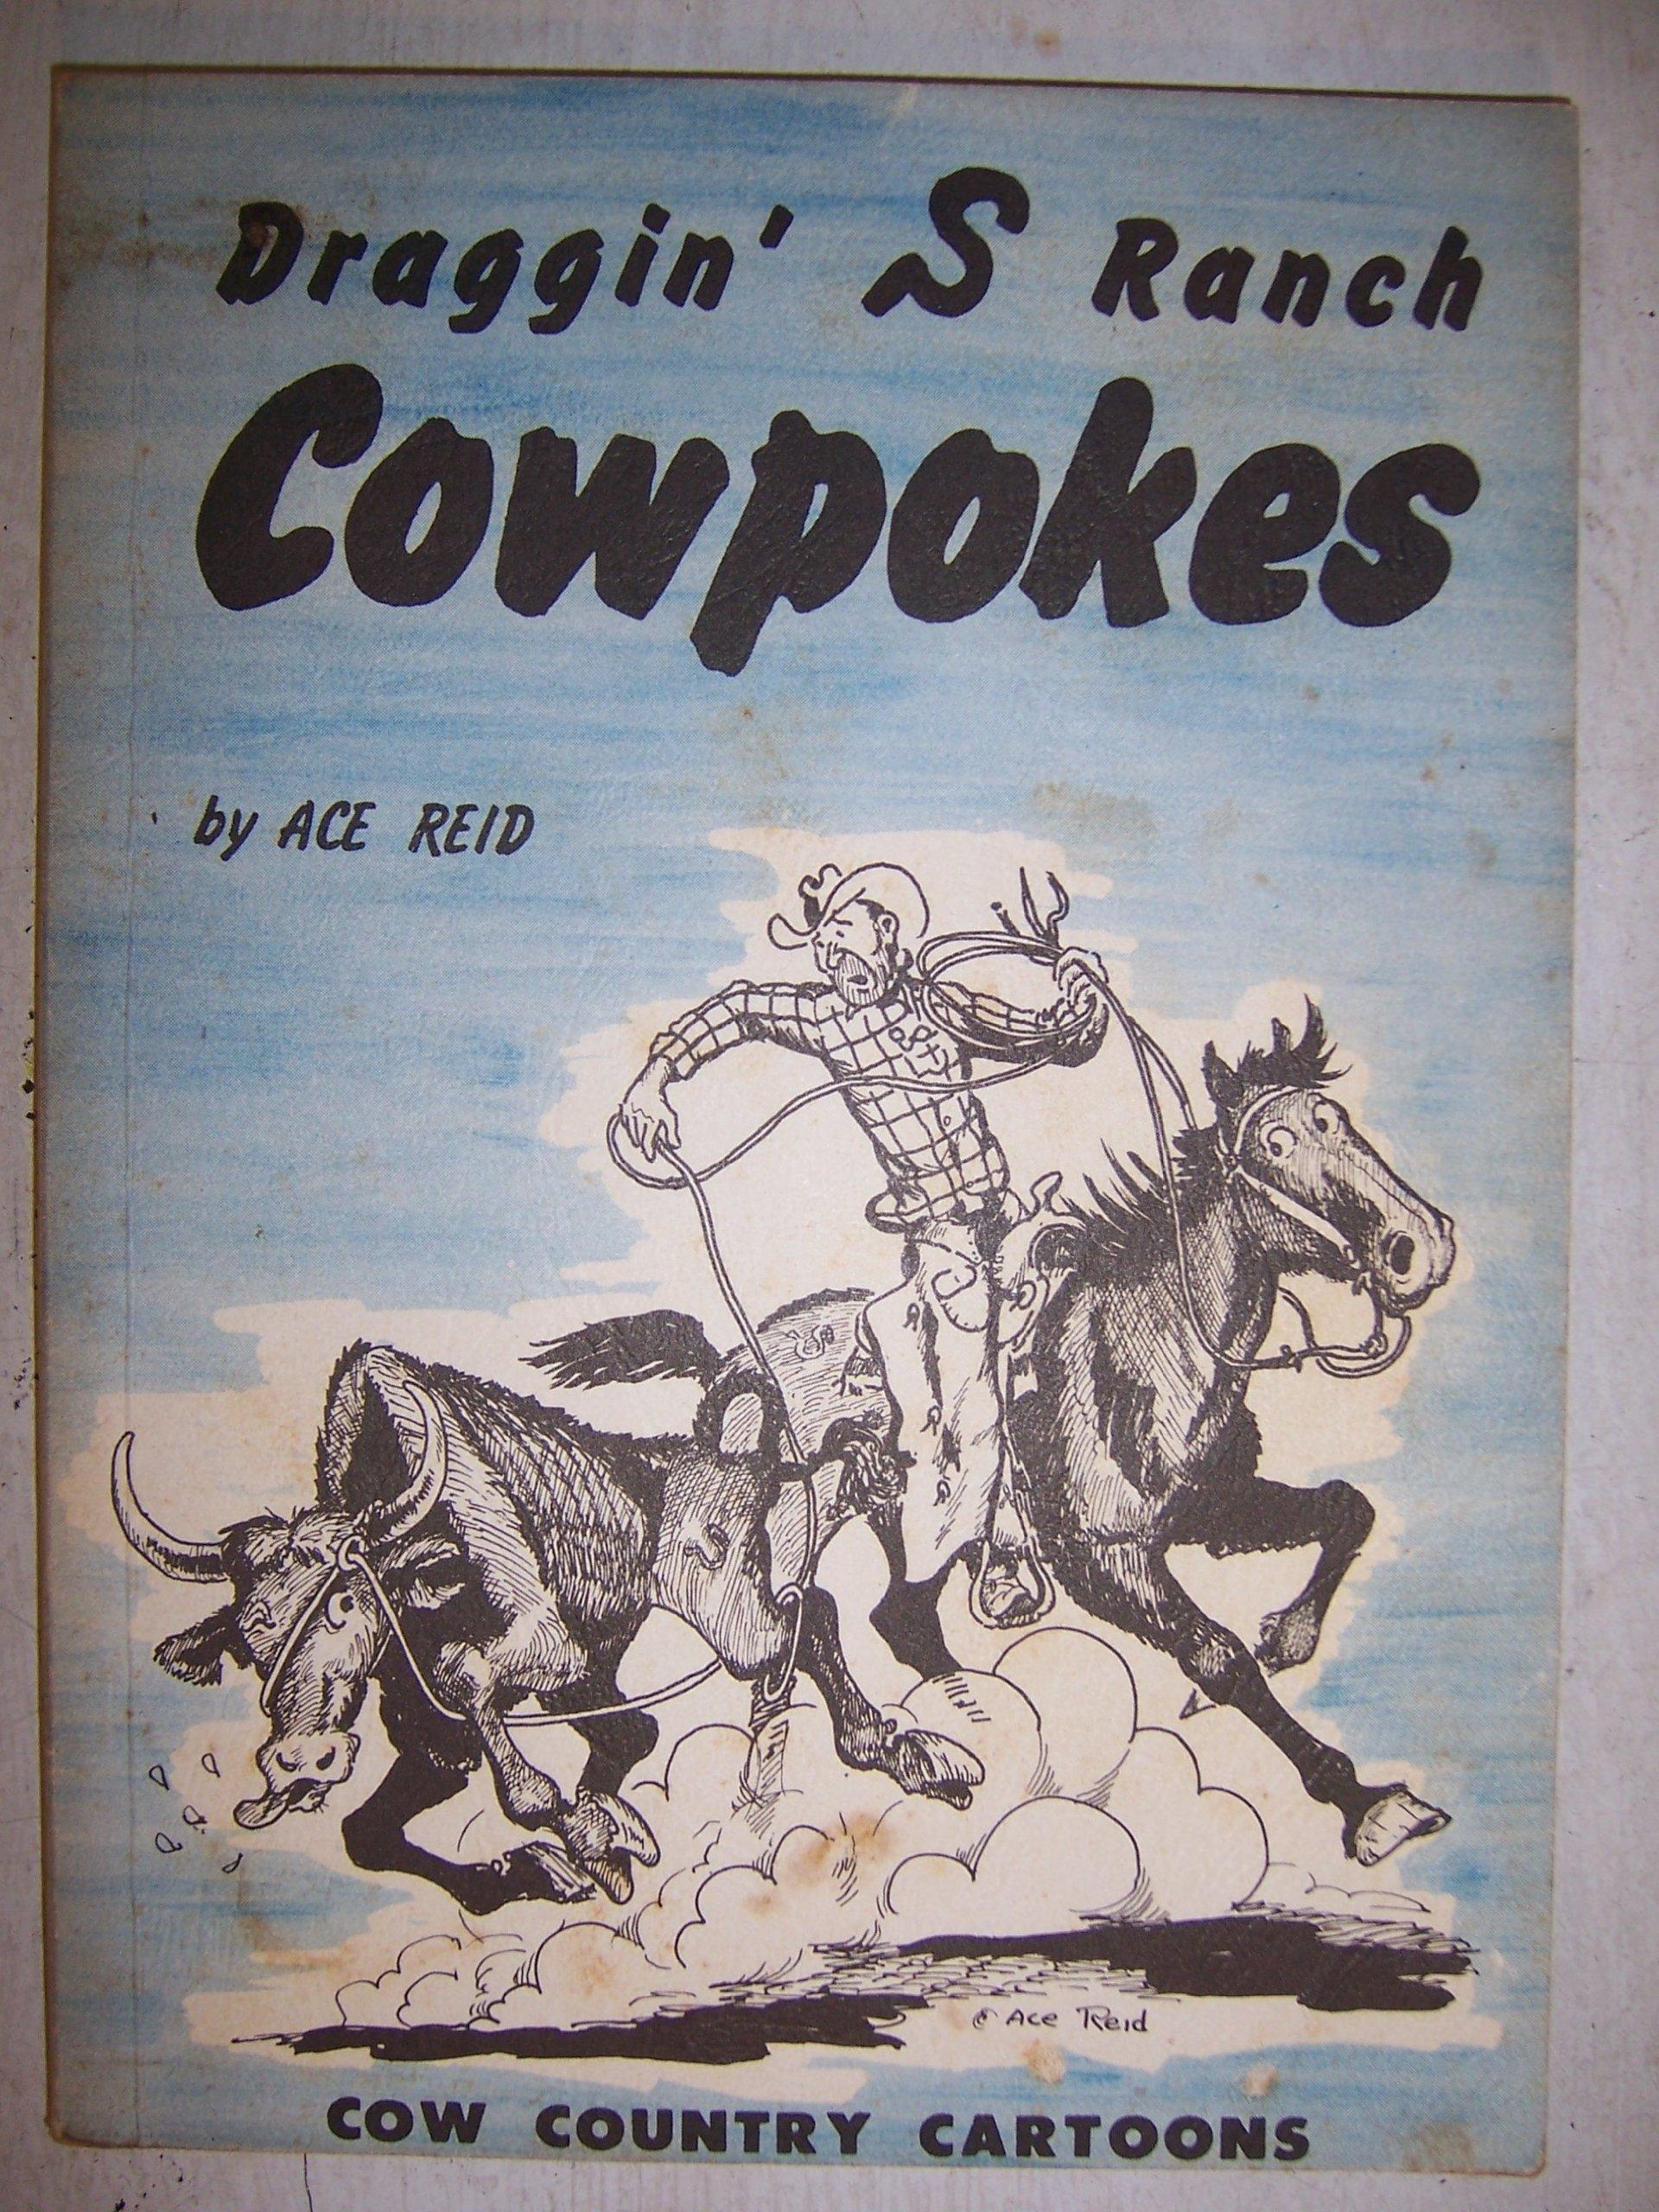 Draggin' S Ranch Cowpokes; Cow Country Cartoons, Reid, Ace